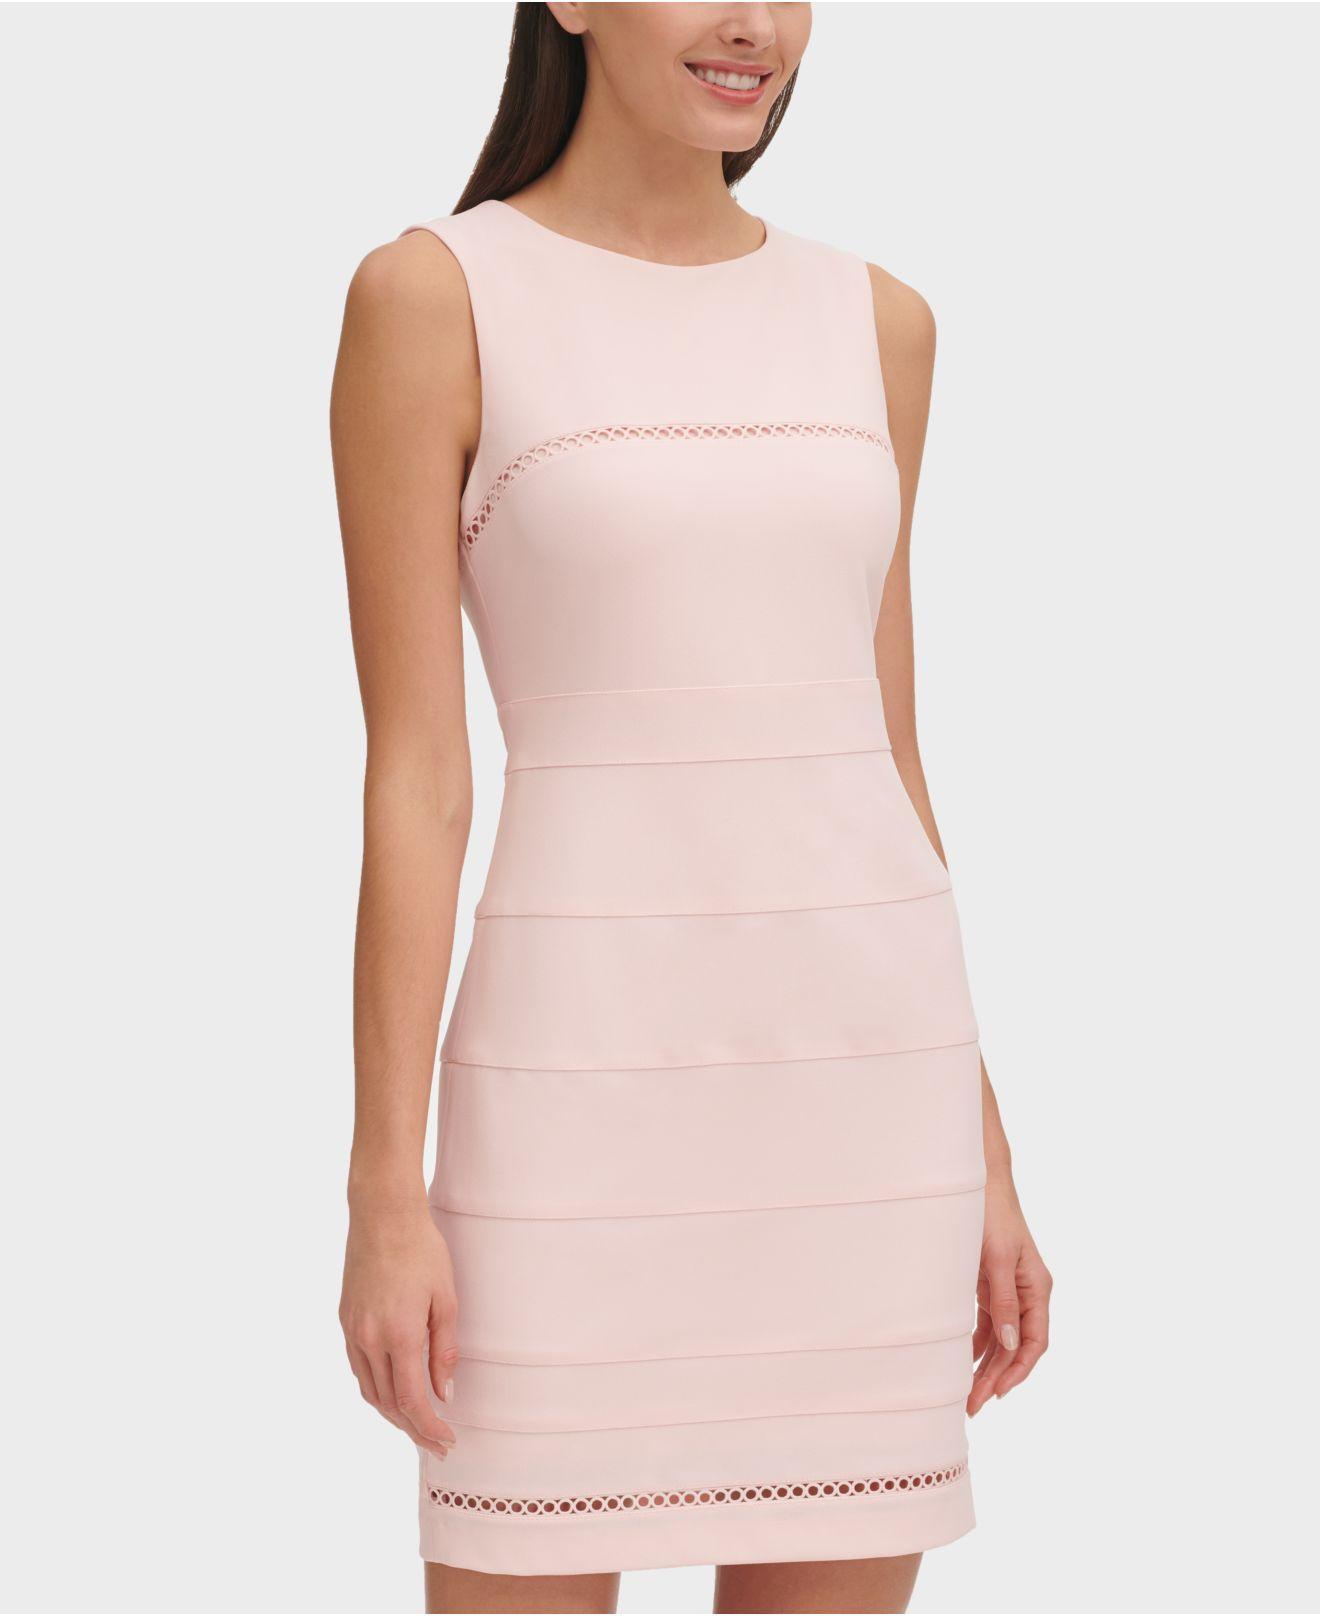 ff78c79f6929 Tommy Hilfiger Circle-trim Dress in Pink - Lyst